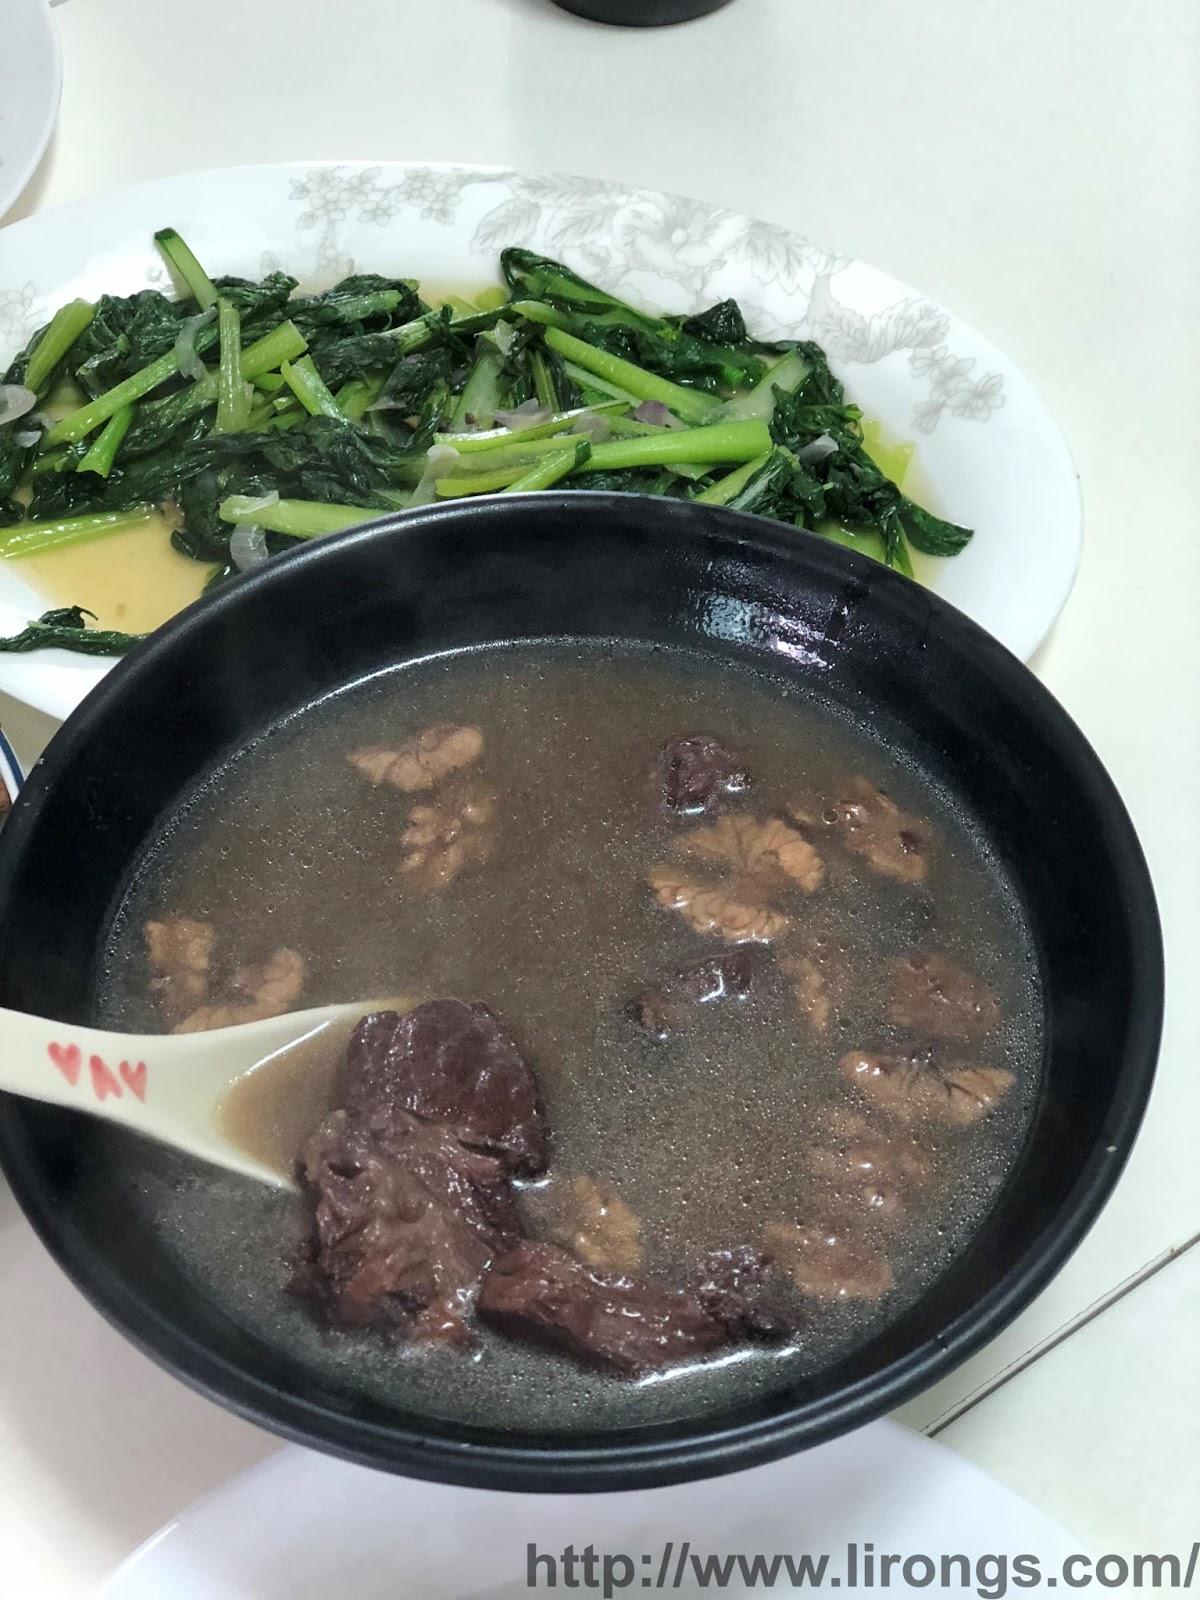 Lirong | A singapore food and lifestyle blog: PEM